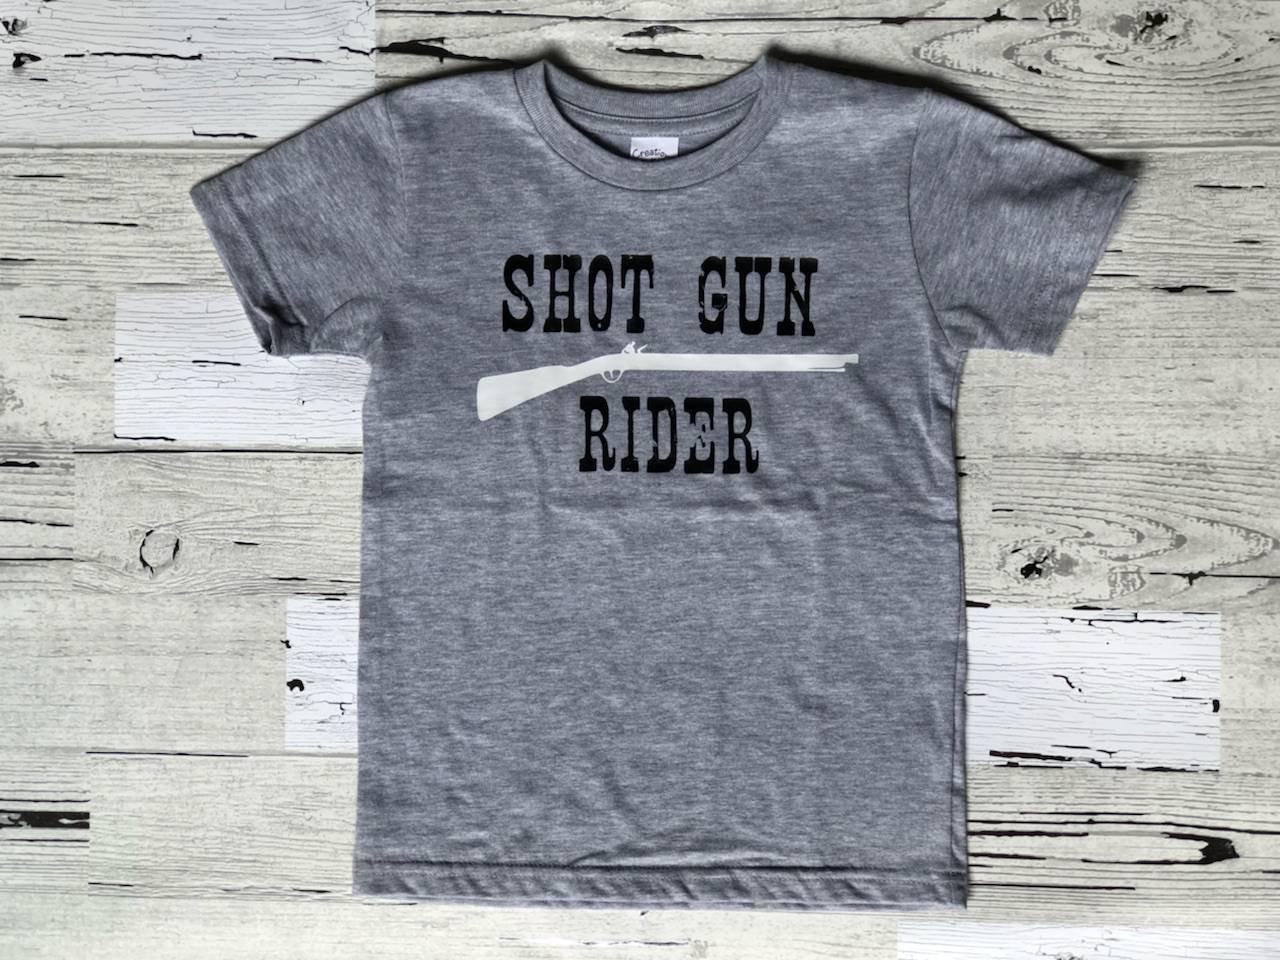 1c96b520b Shot Gun Rider Toddler T-shirt/Cute Toddler Tshirt/Boy or Girl Custom T- shirt/Country Kids Shirt/Shot Gun Rider